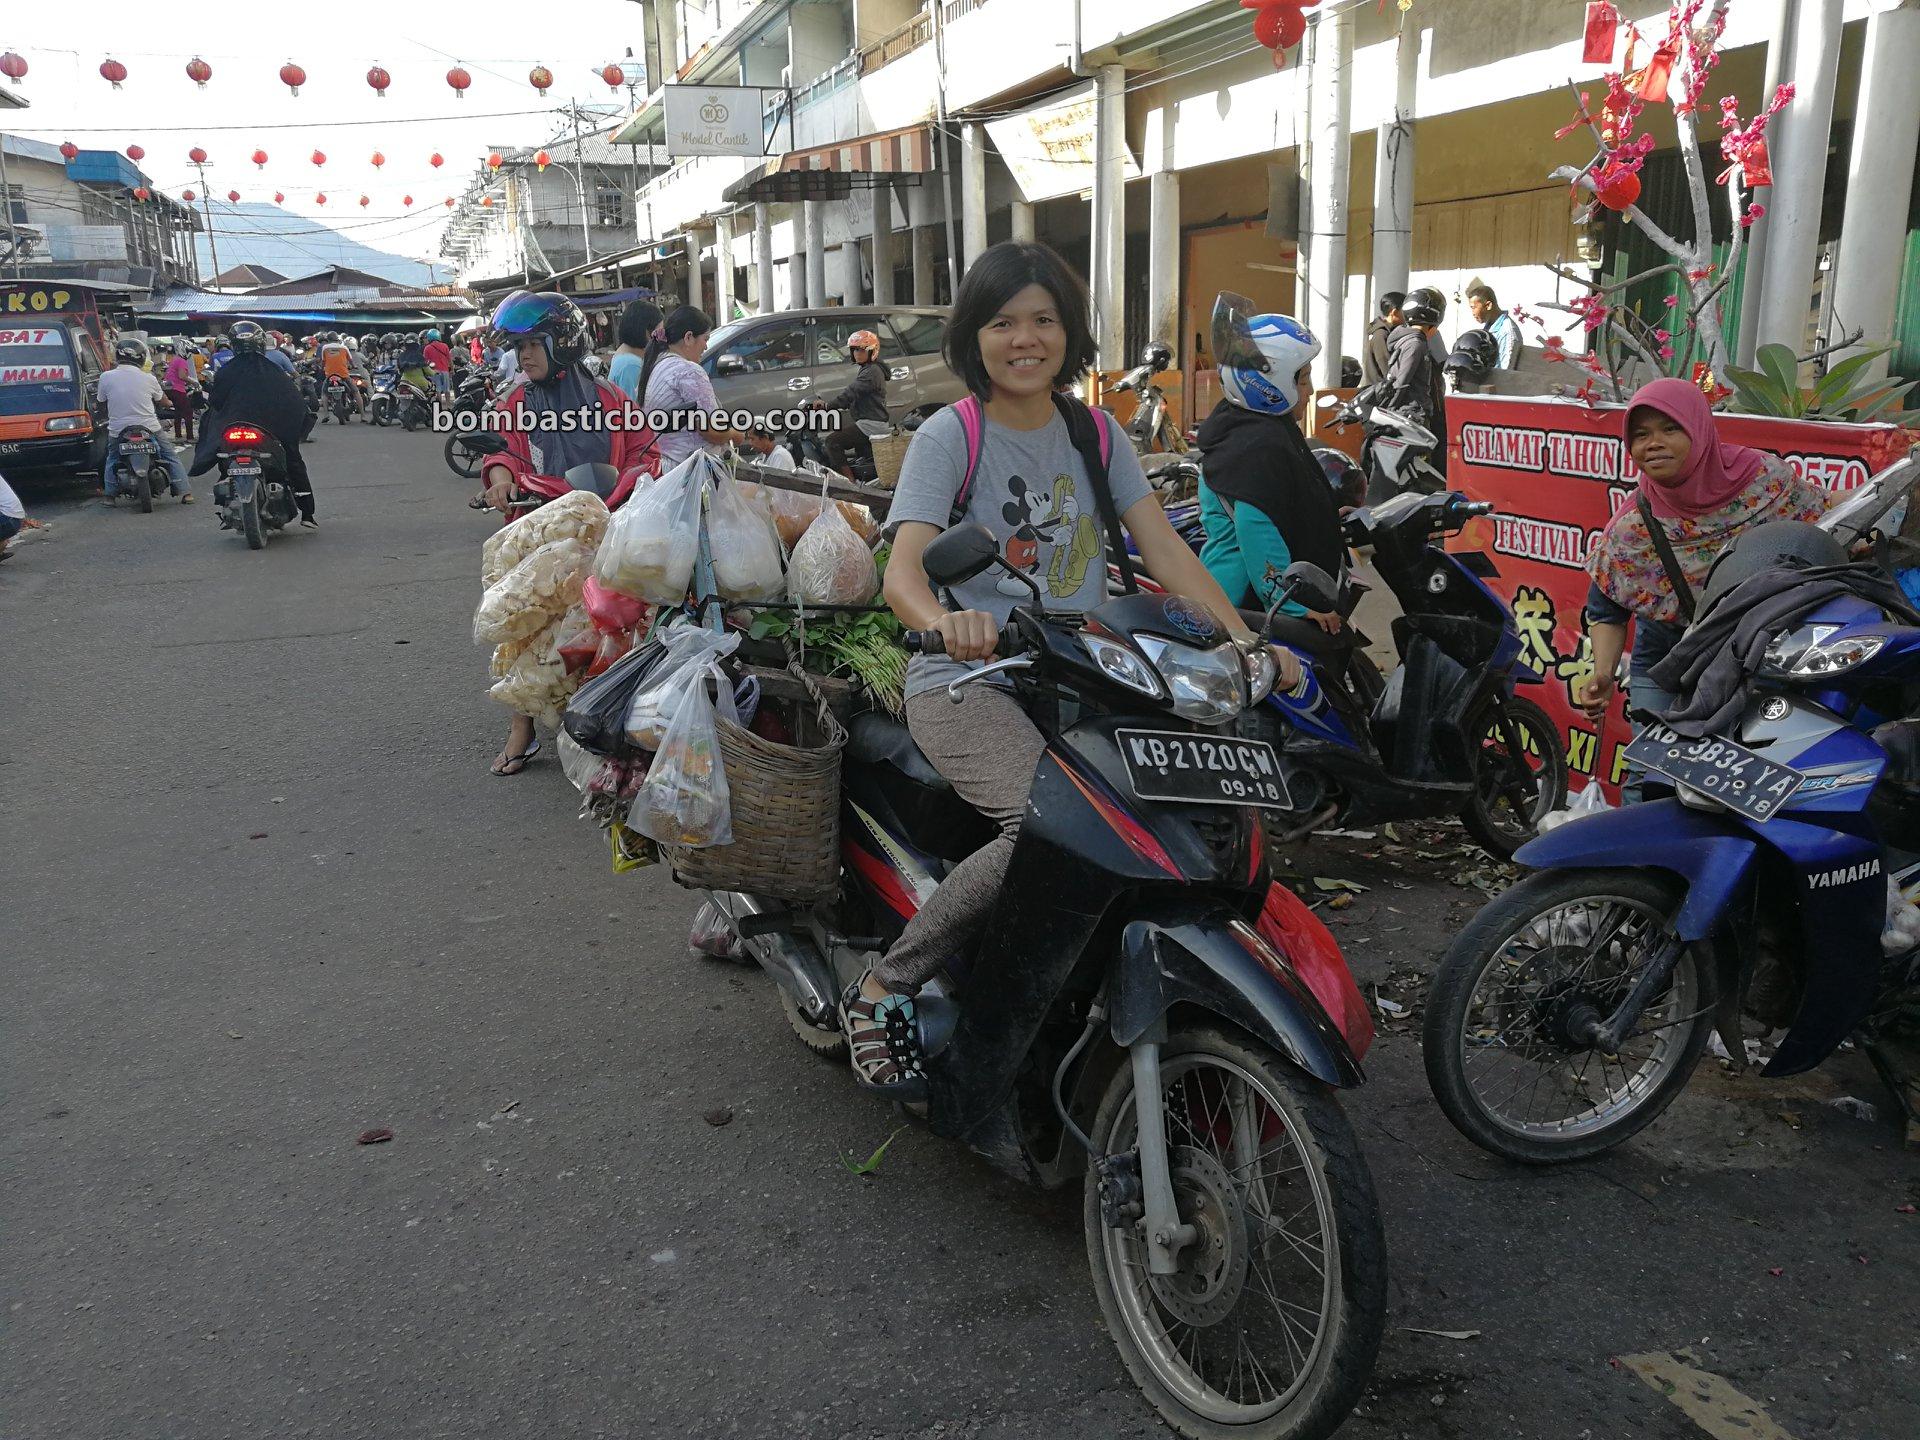 Pasar Turi, authentic, traditional, Indonesia, Kota Amoi, seafood, sayuran, vegetable, Tourism, tourist attraction, Trans Borneo, 婆罗洲旅游景点, 印尼西加里曼丹, 山口洋早市